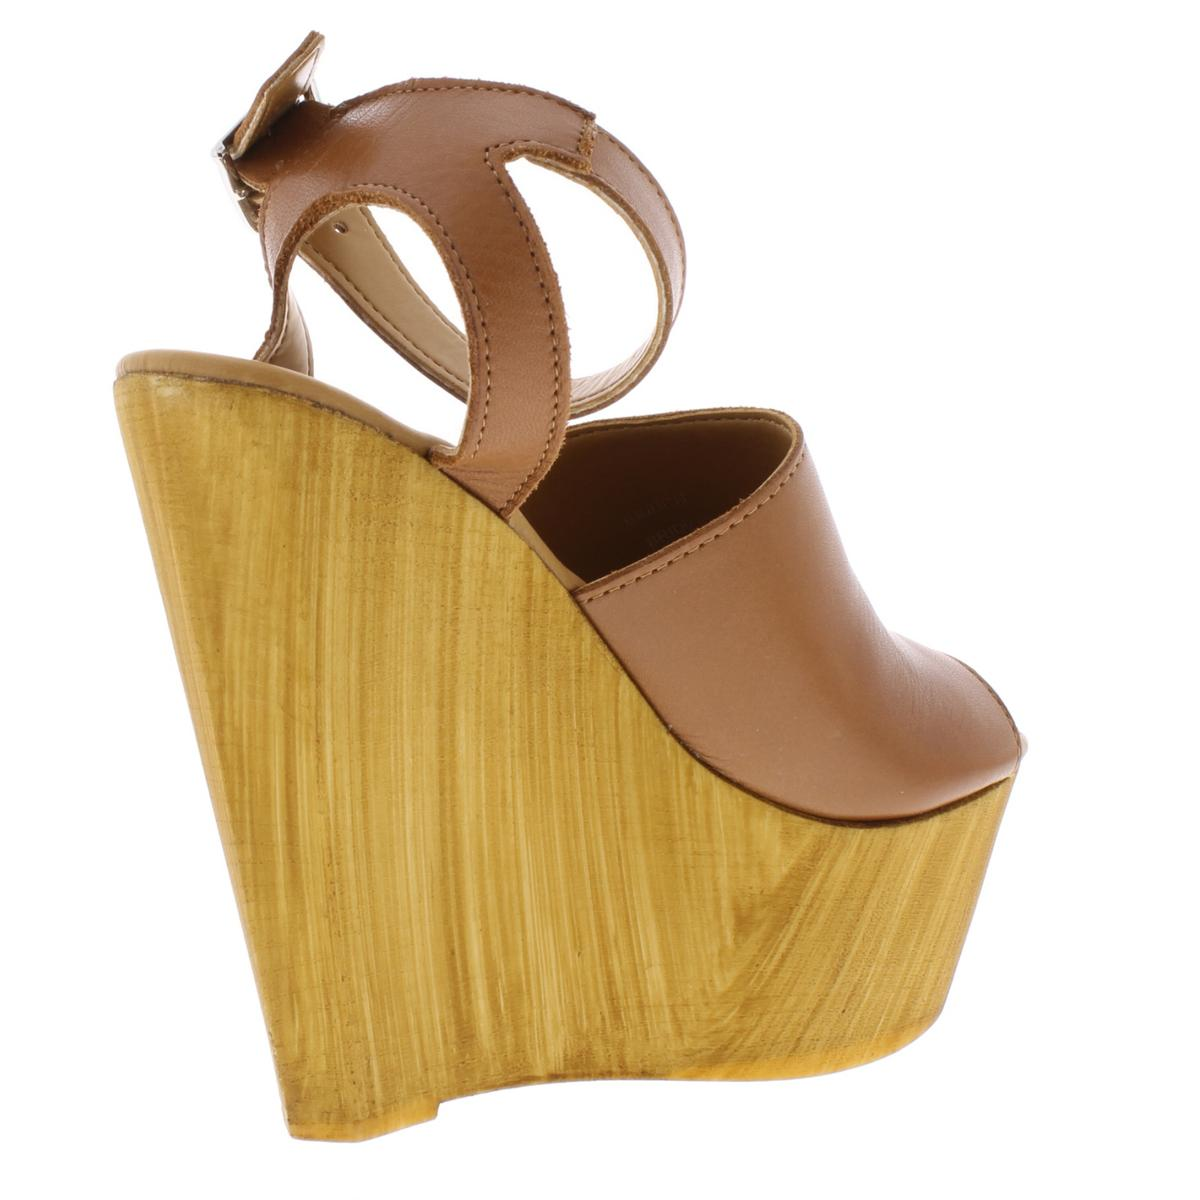 Steve Madden Womens Bridgit Leather Platform Wedge Sandals Shoes BHFO 2046